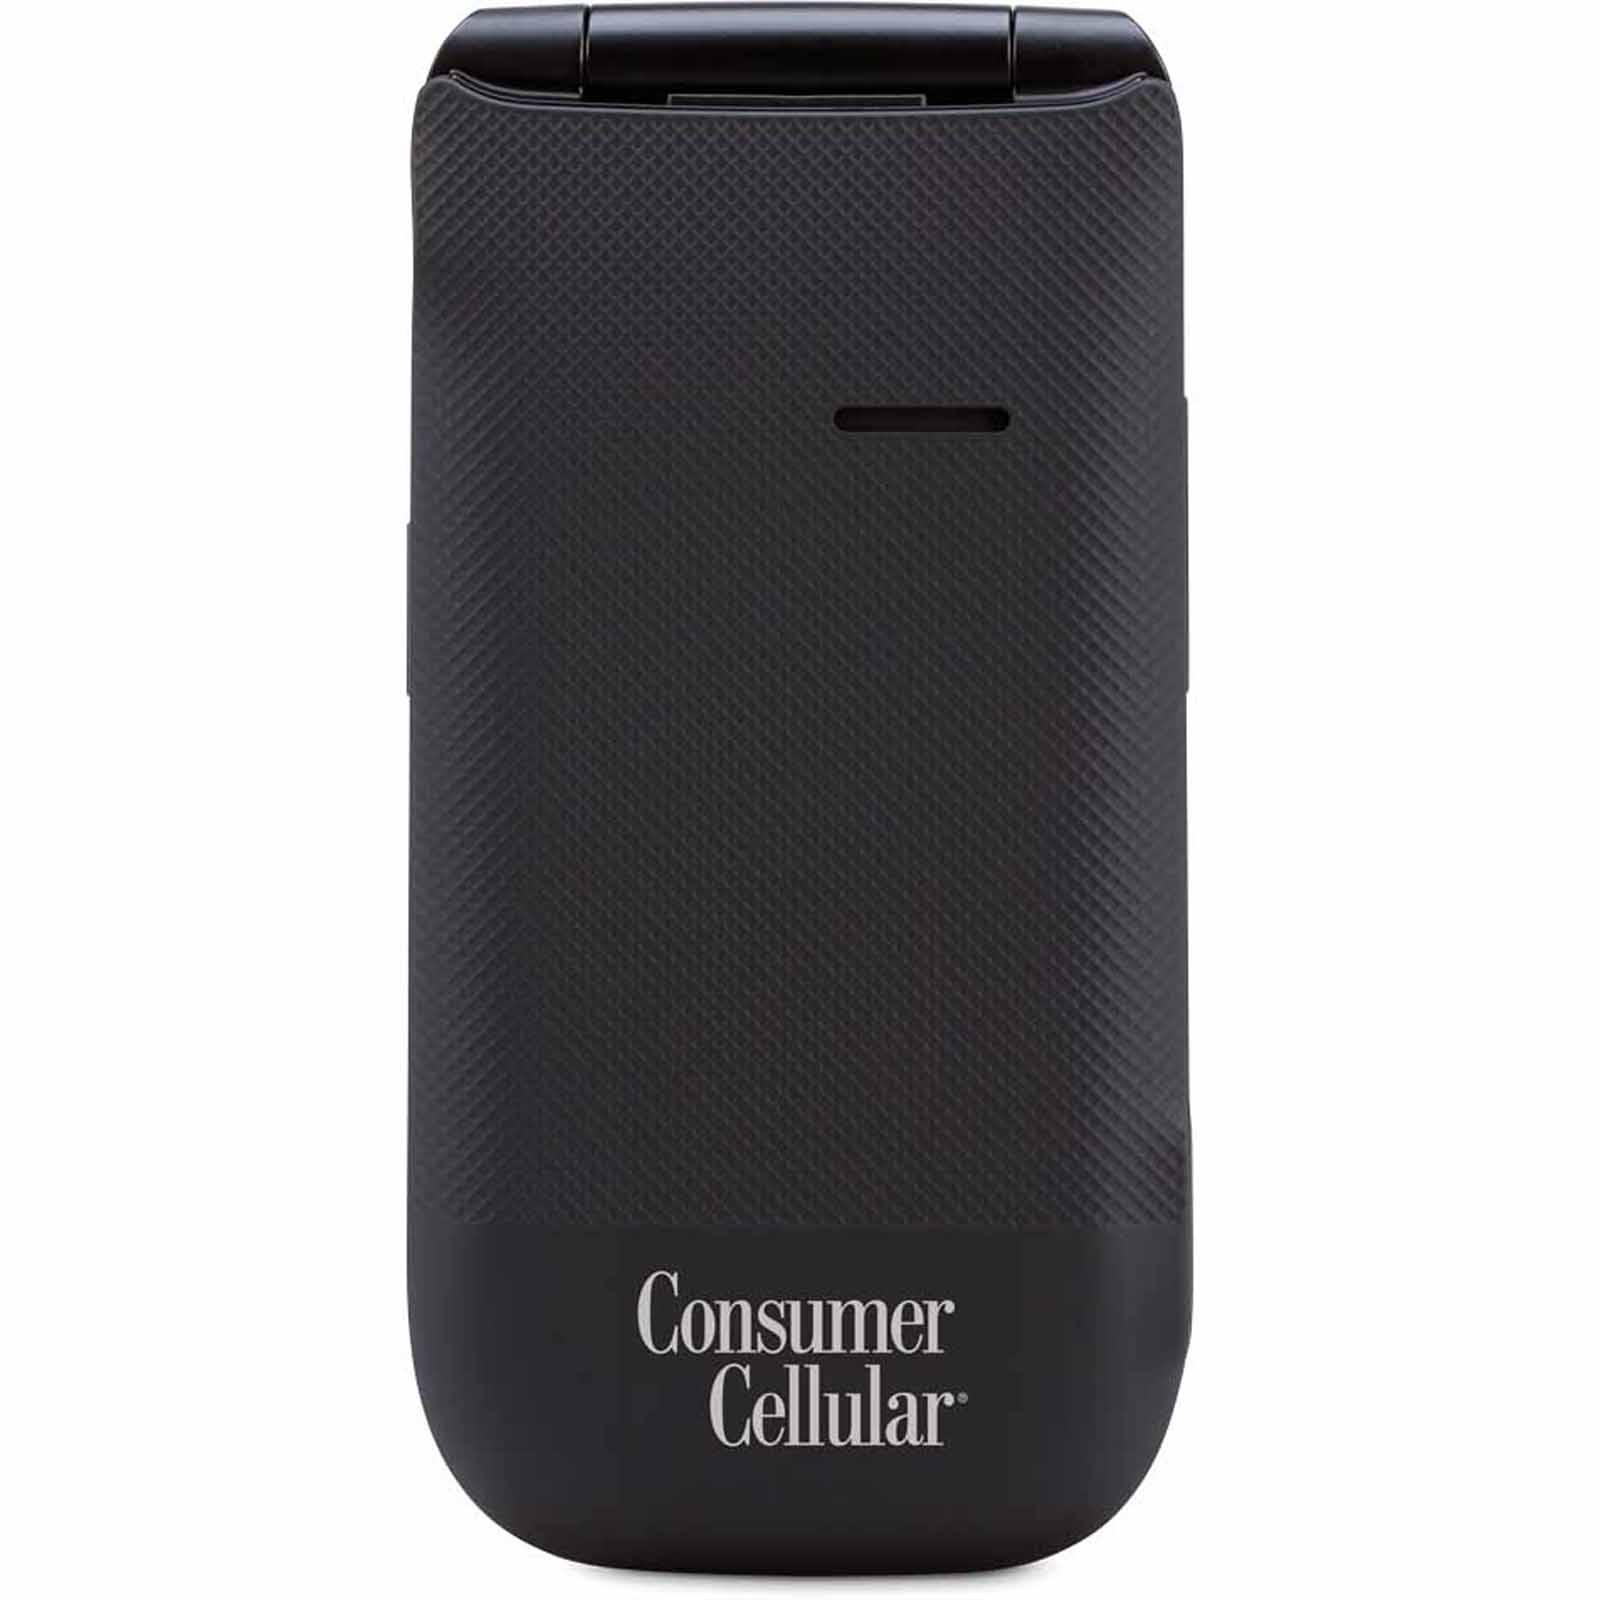 Consumer Cellular 101 Cell Phone - Black